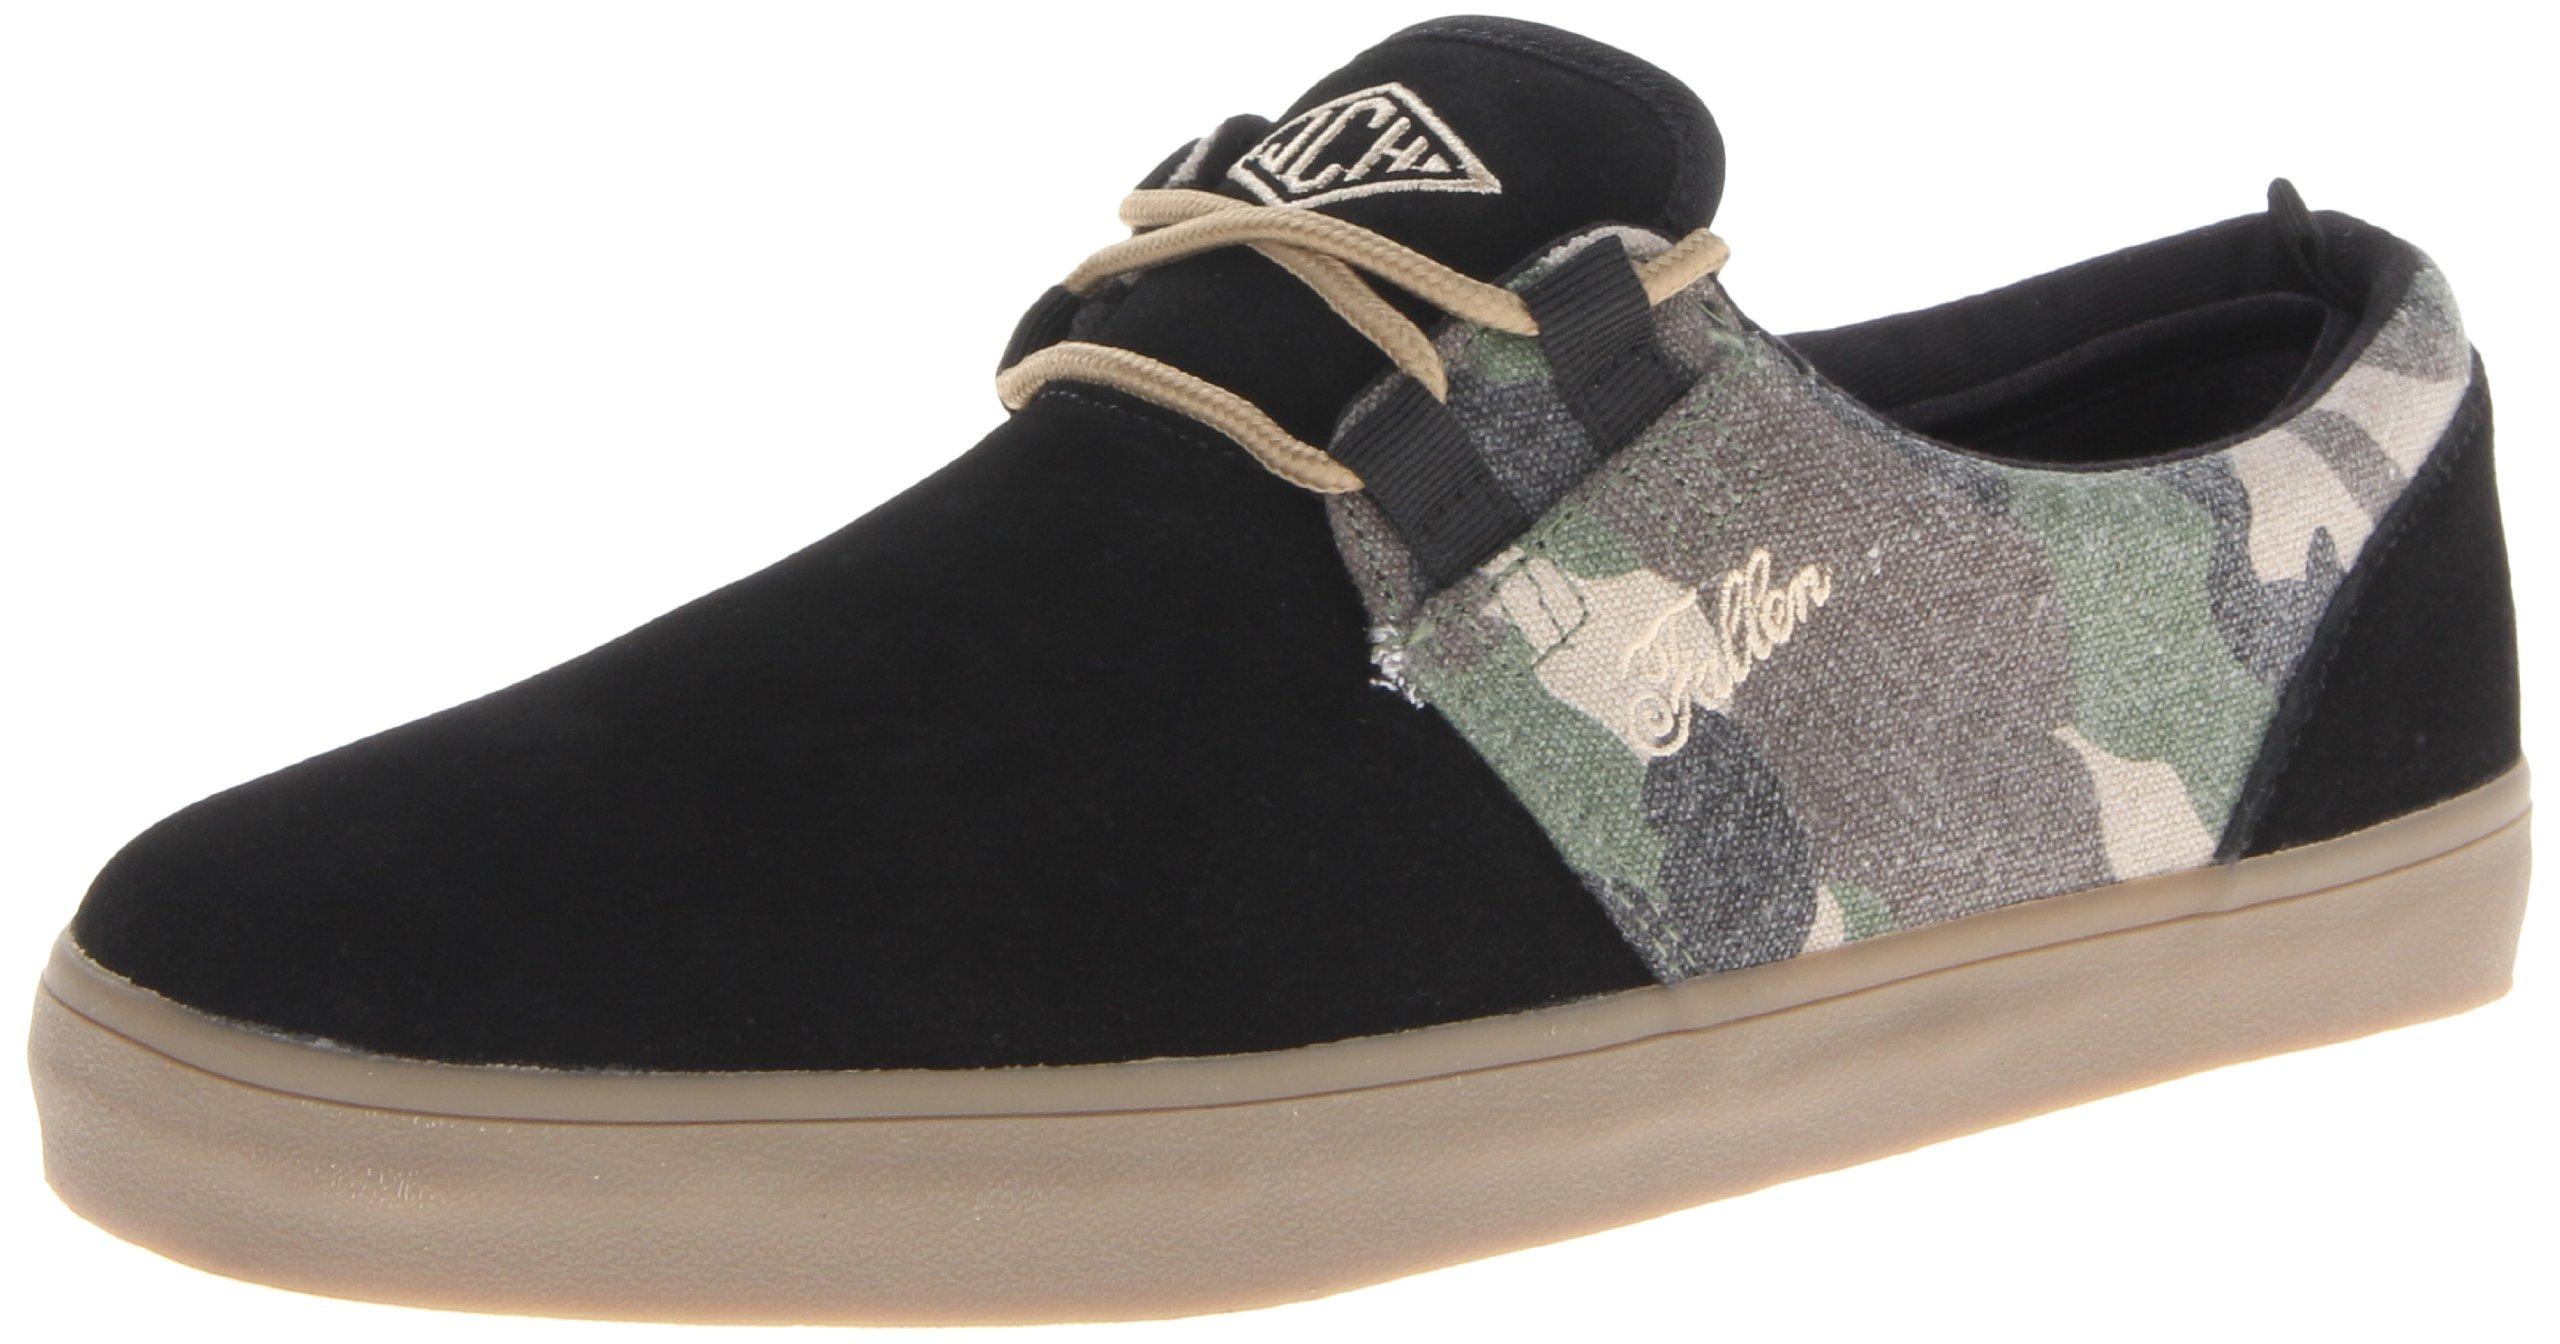 Fallen Capitol Skateboarding Shoe,Black/Camo,11.5 M US